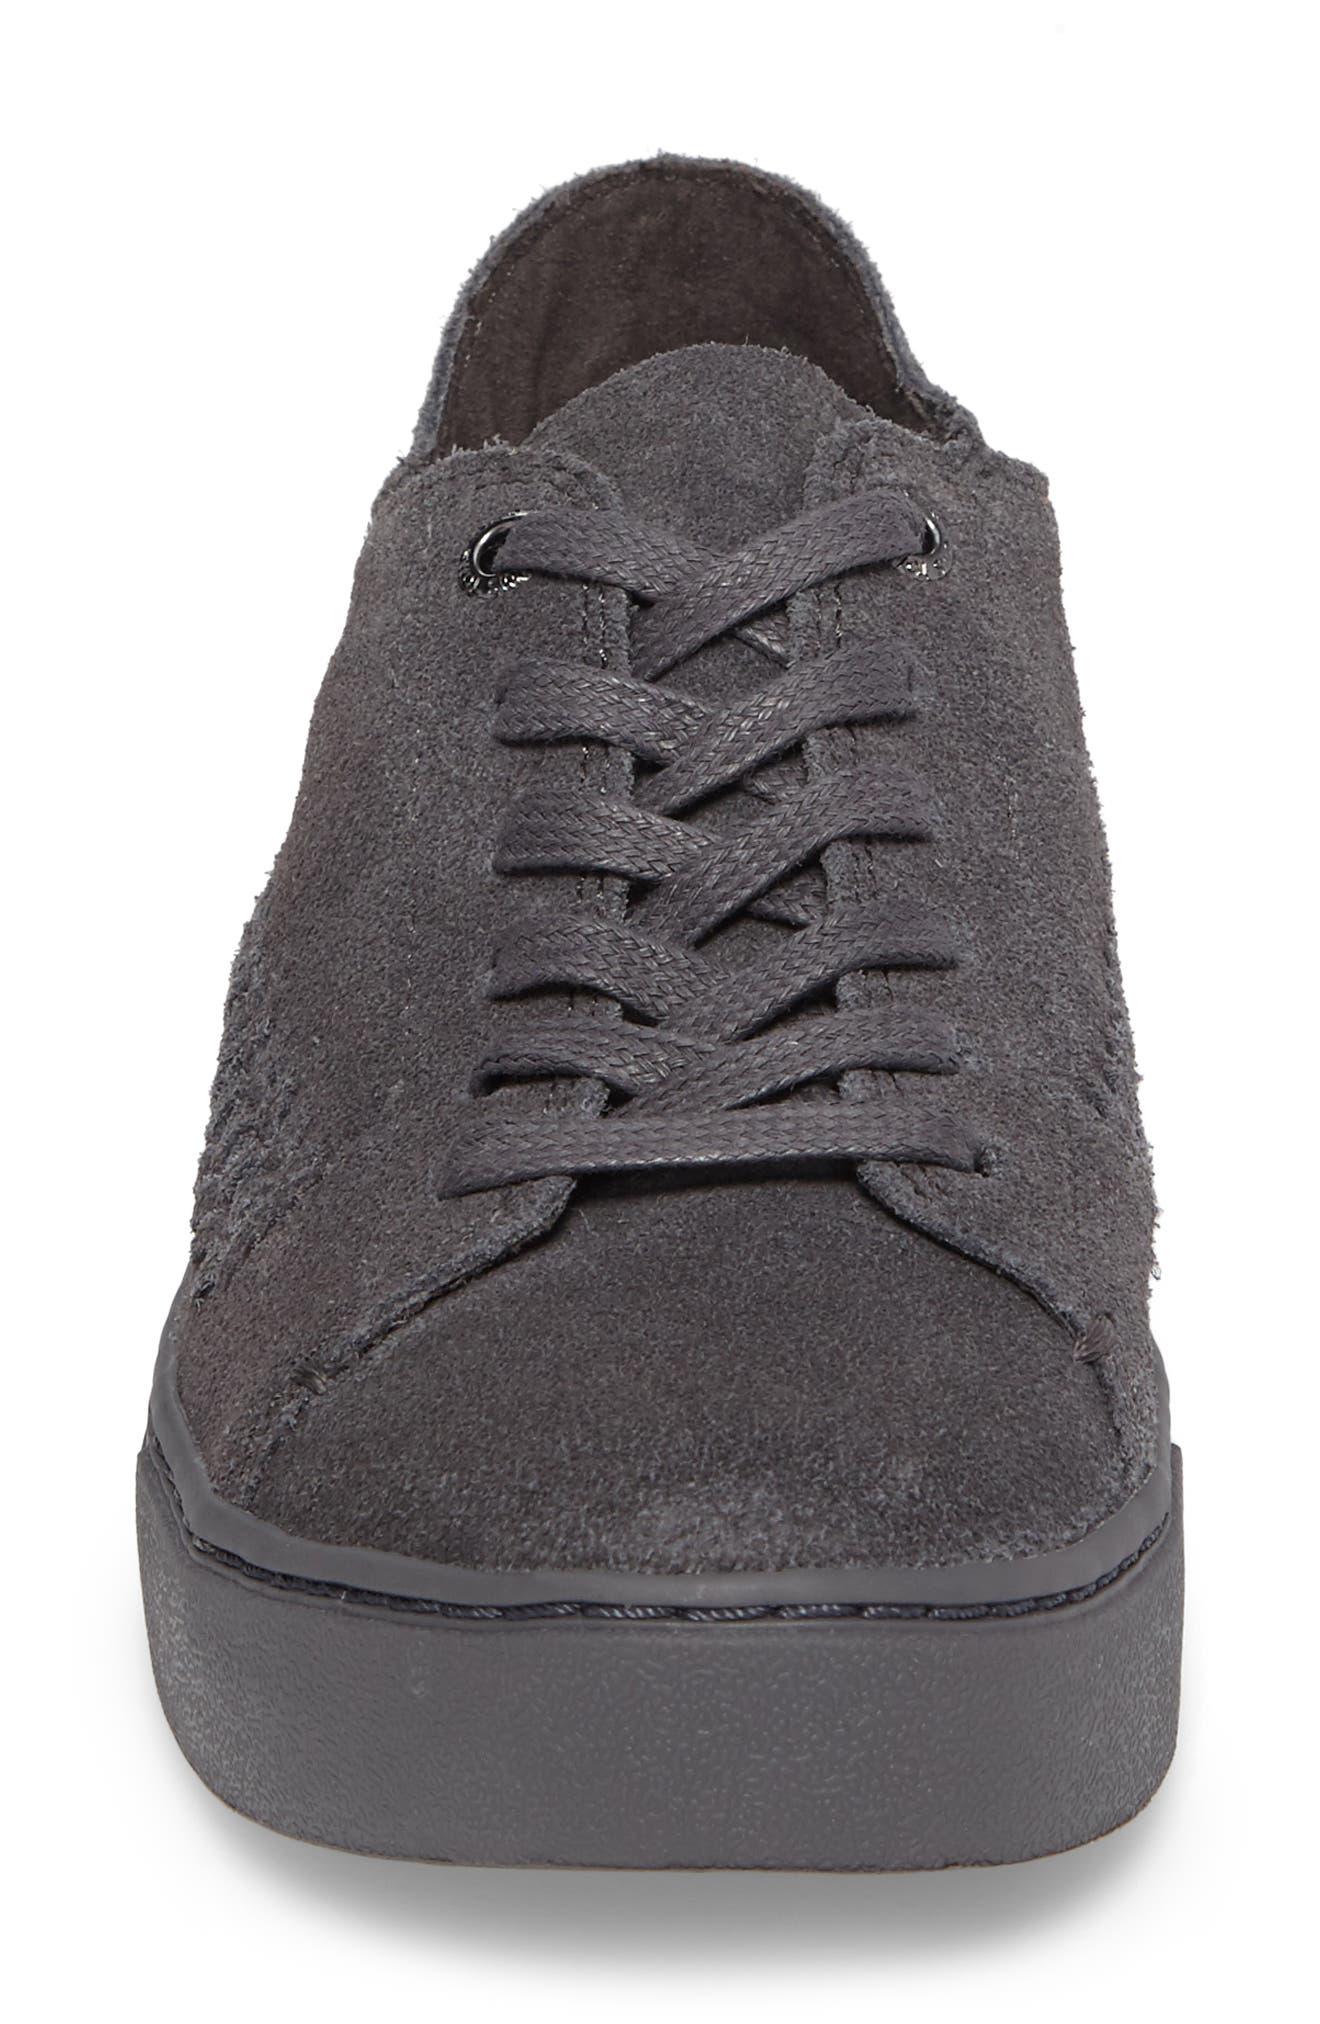 Lenox Sneaker,                             Alternate thumbnail 51, color,